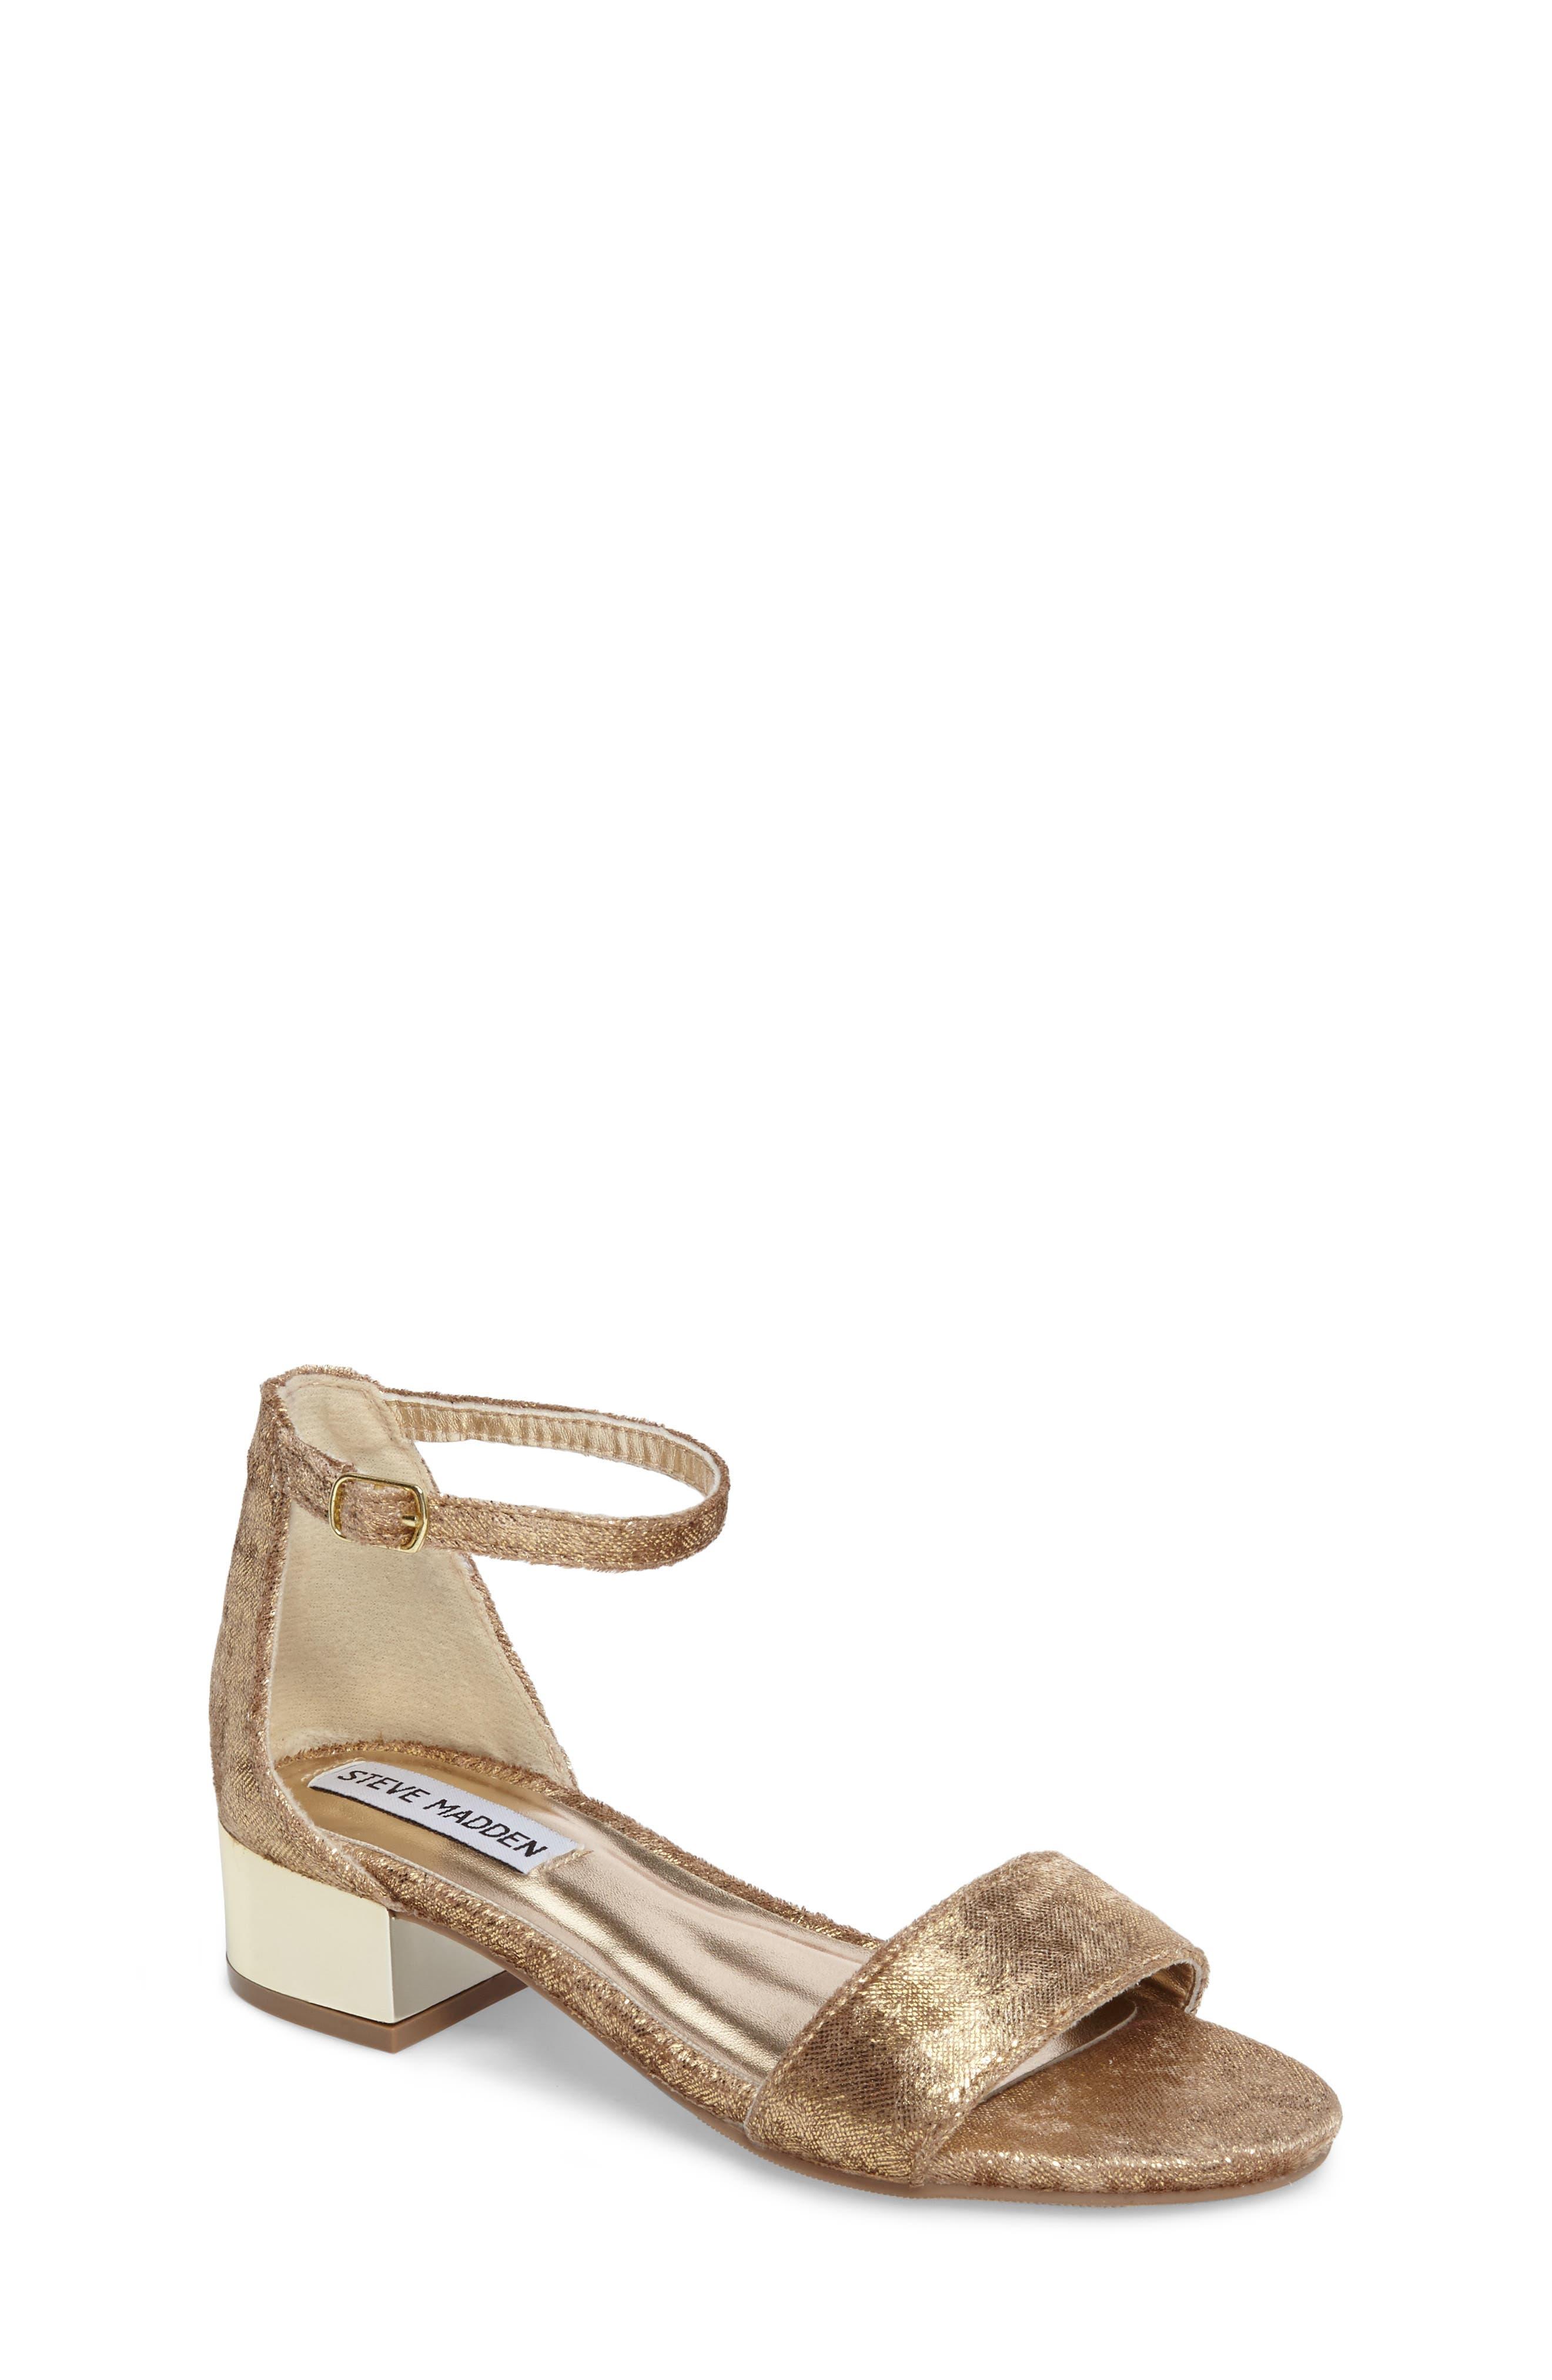 Jirene Metallic Sandal,                             Main thumbnail 1, color,                             Gold Crushed Velvet